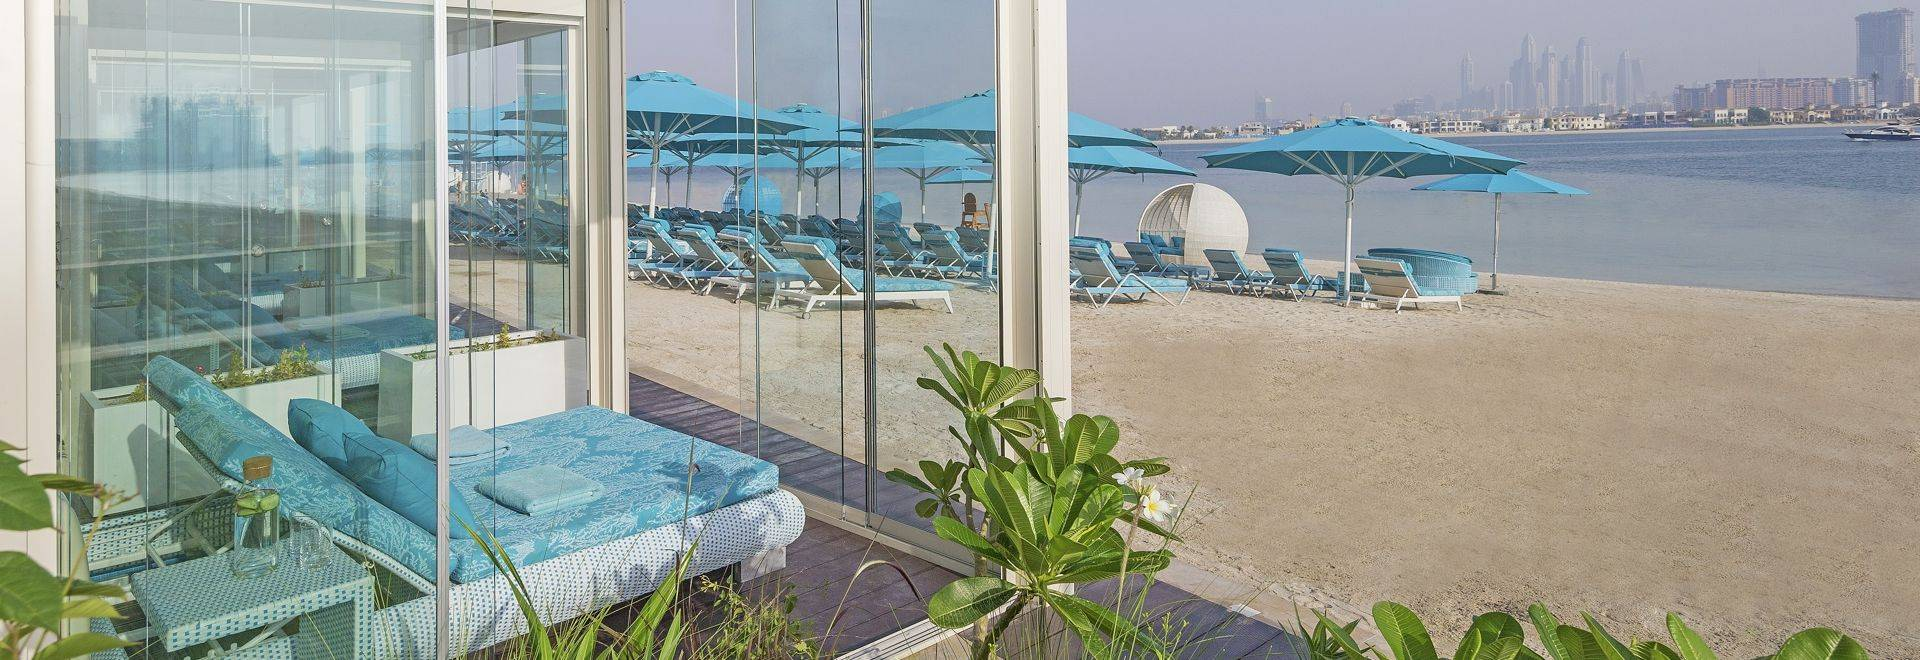 Air Conditioned Cabanas.jpg